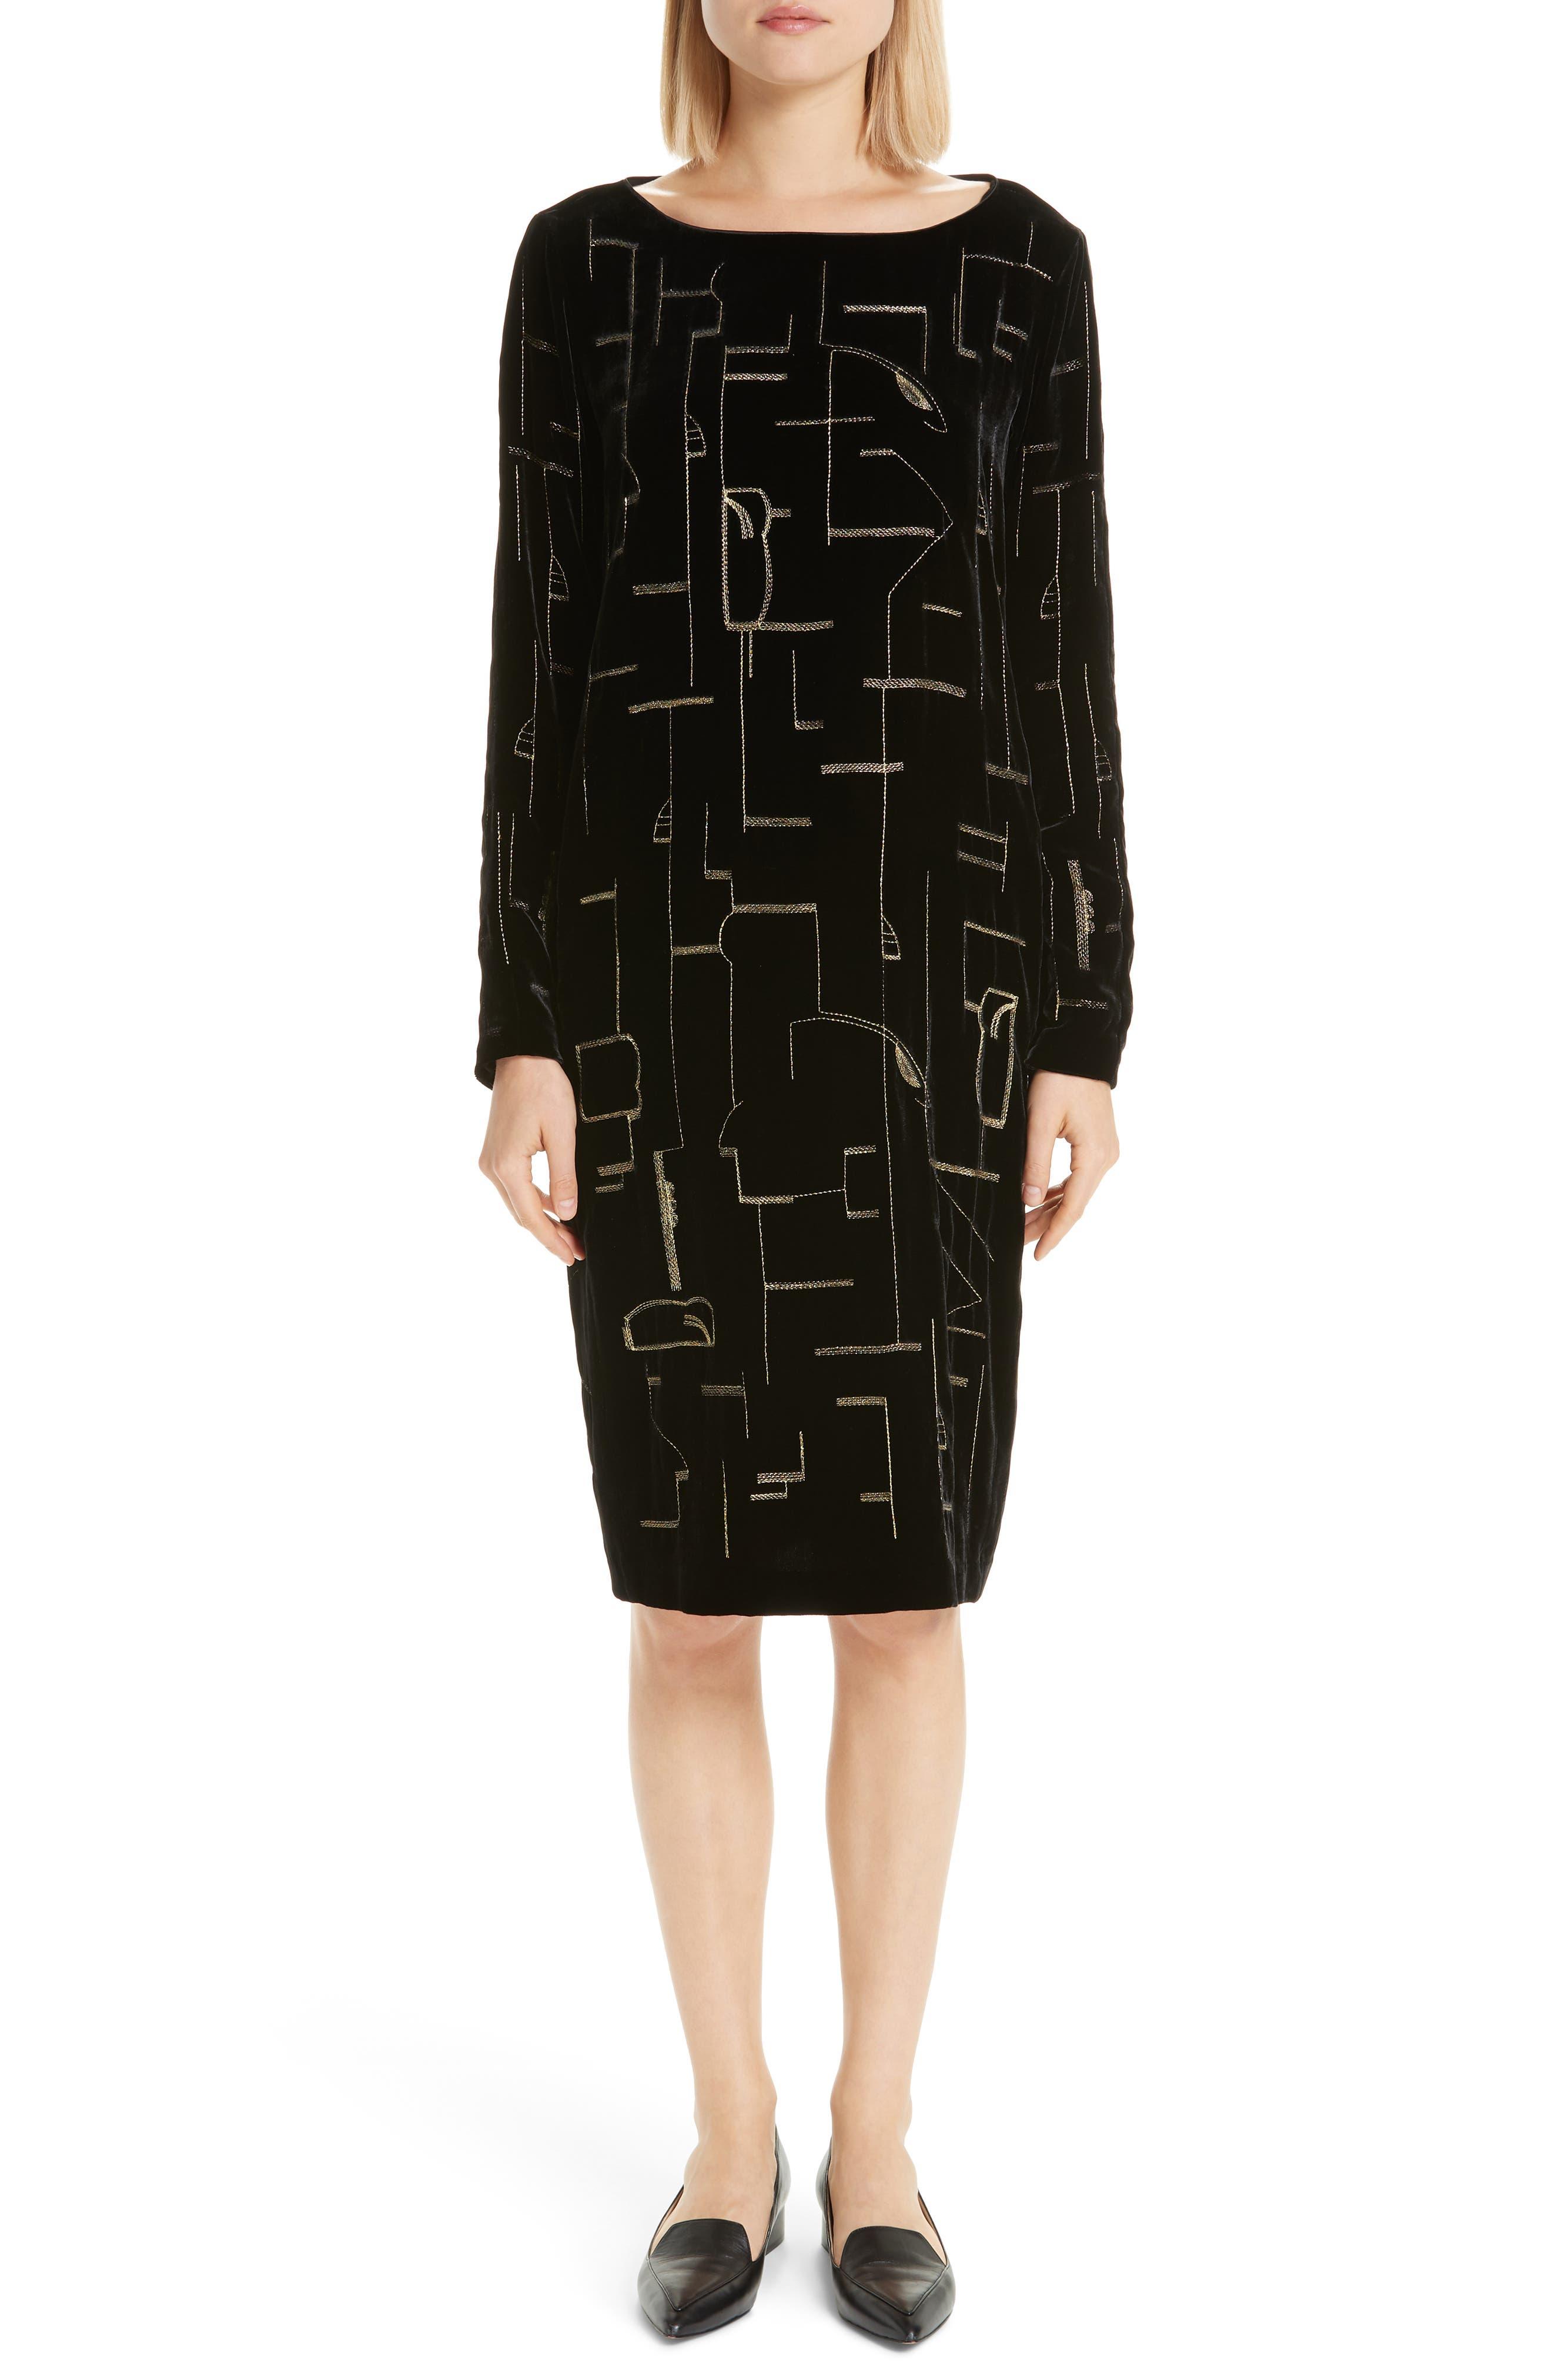 LAFAYETTE 148 NEW YORK Cressida Embellished Velvet Dress, Main, color, BLACK MULTI